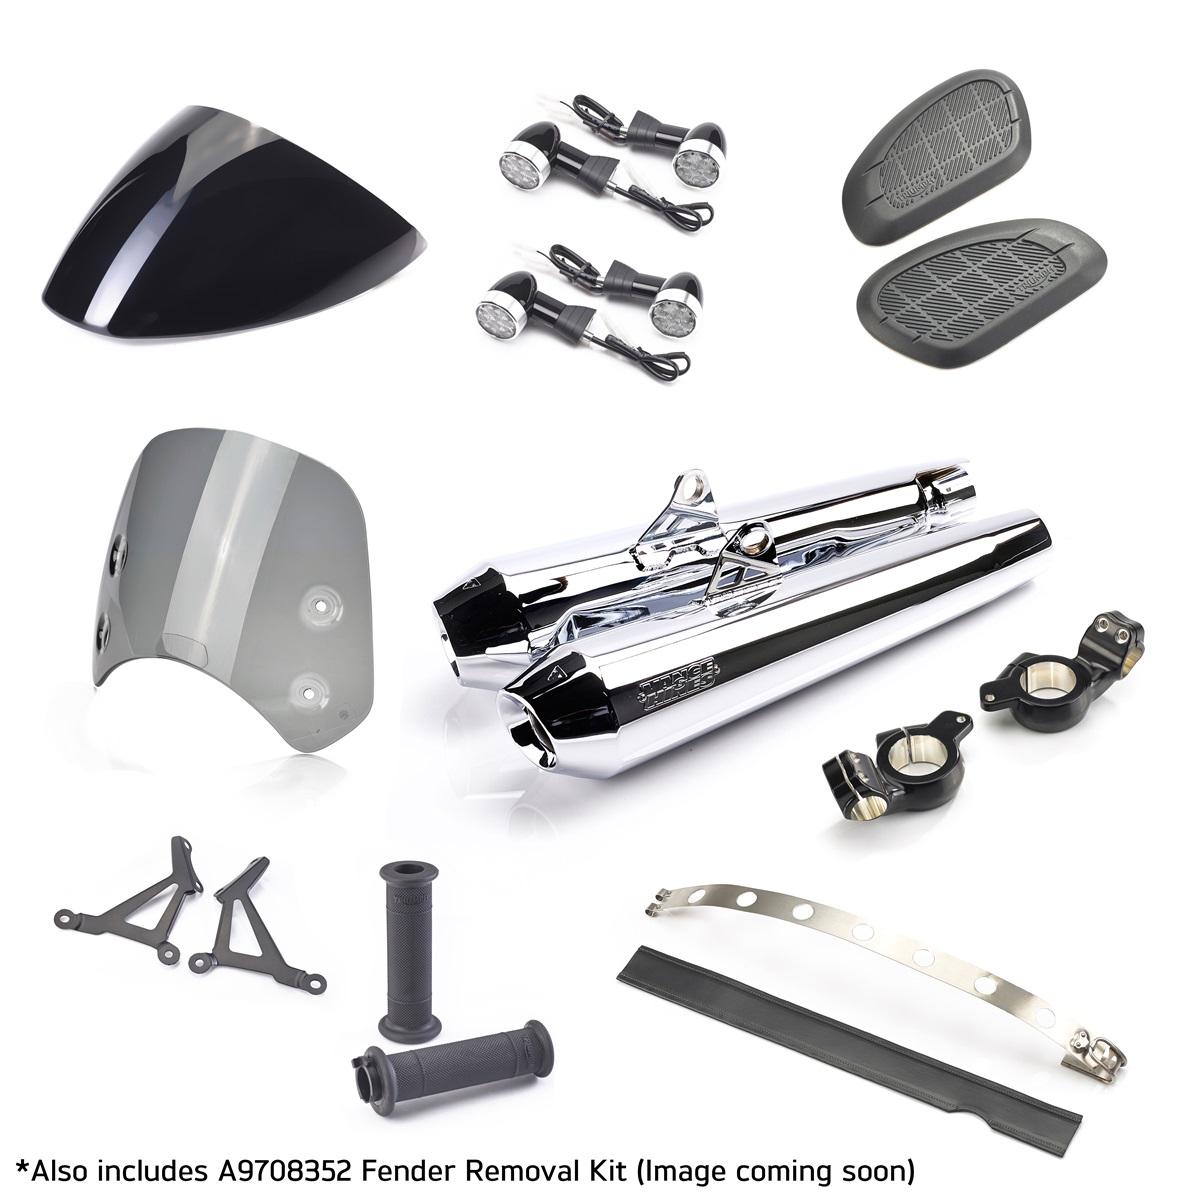 cafe racer kit thruxton thruxton komplette umbau kits. Black Bedroom Furniture Sets. Home Design Ideas